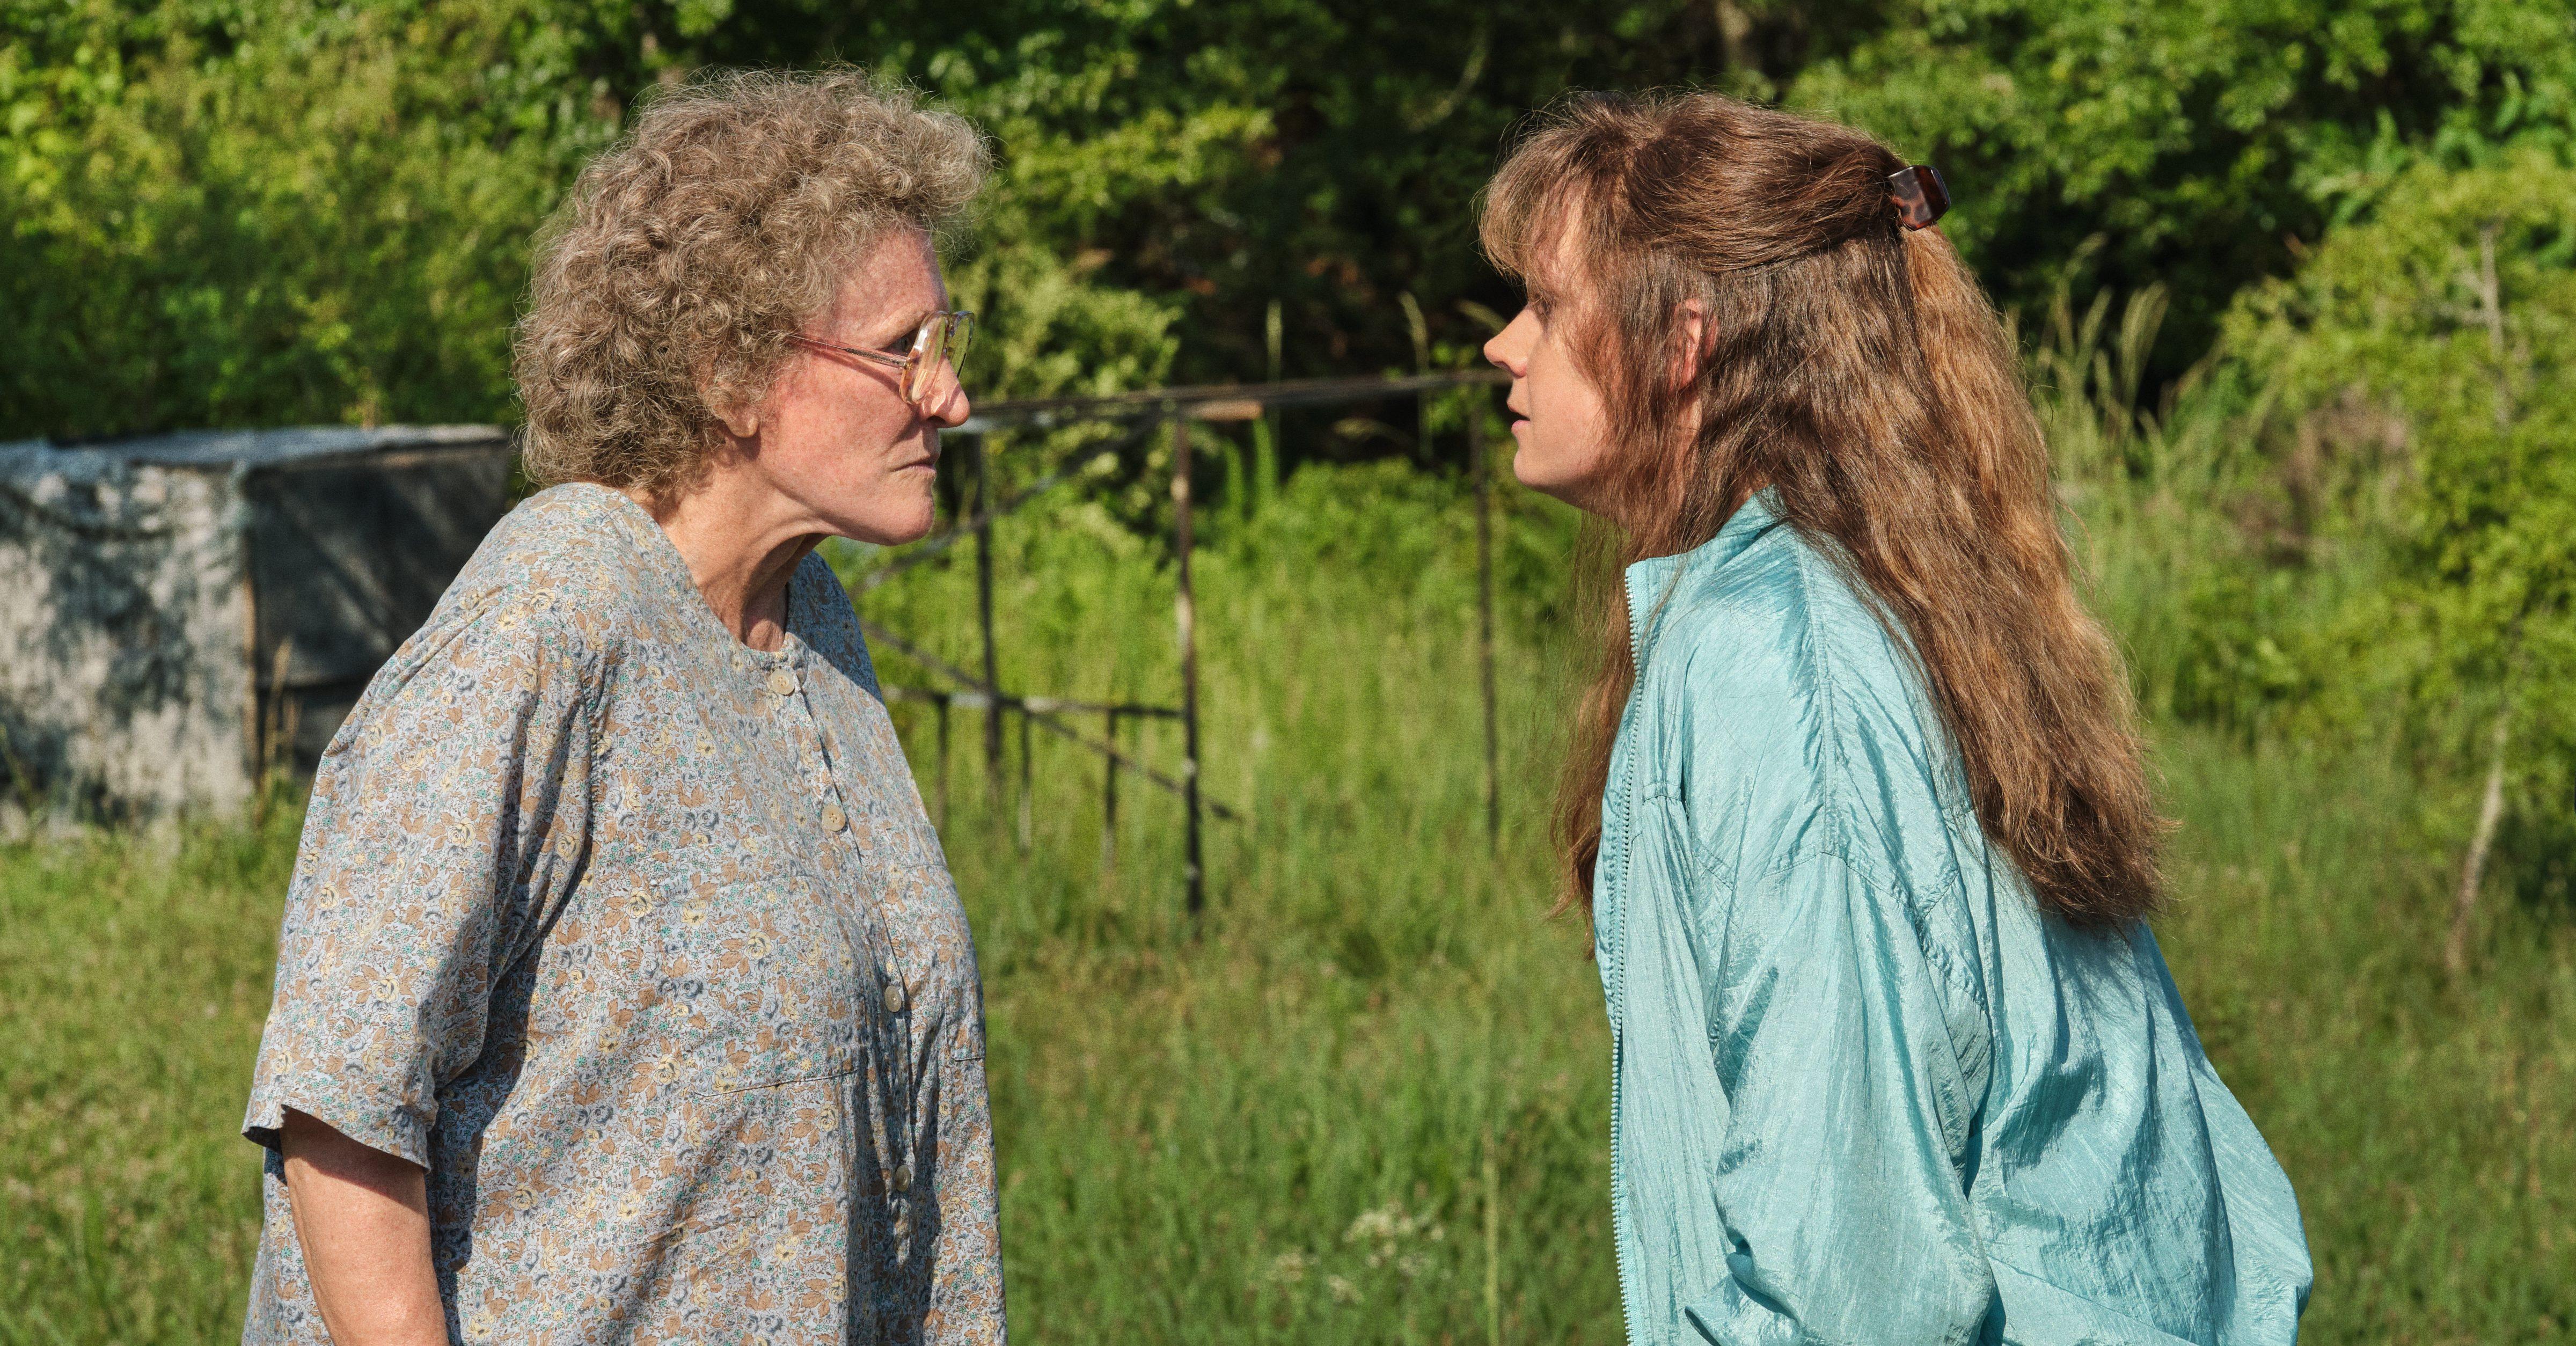 Hillbilly Elegy - Will this get Glenn Close & Amy Adams an Oscar?